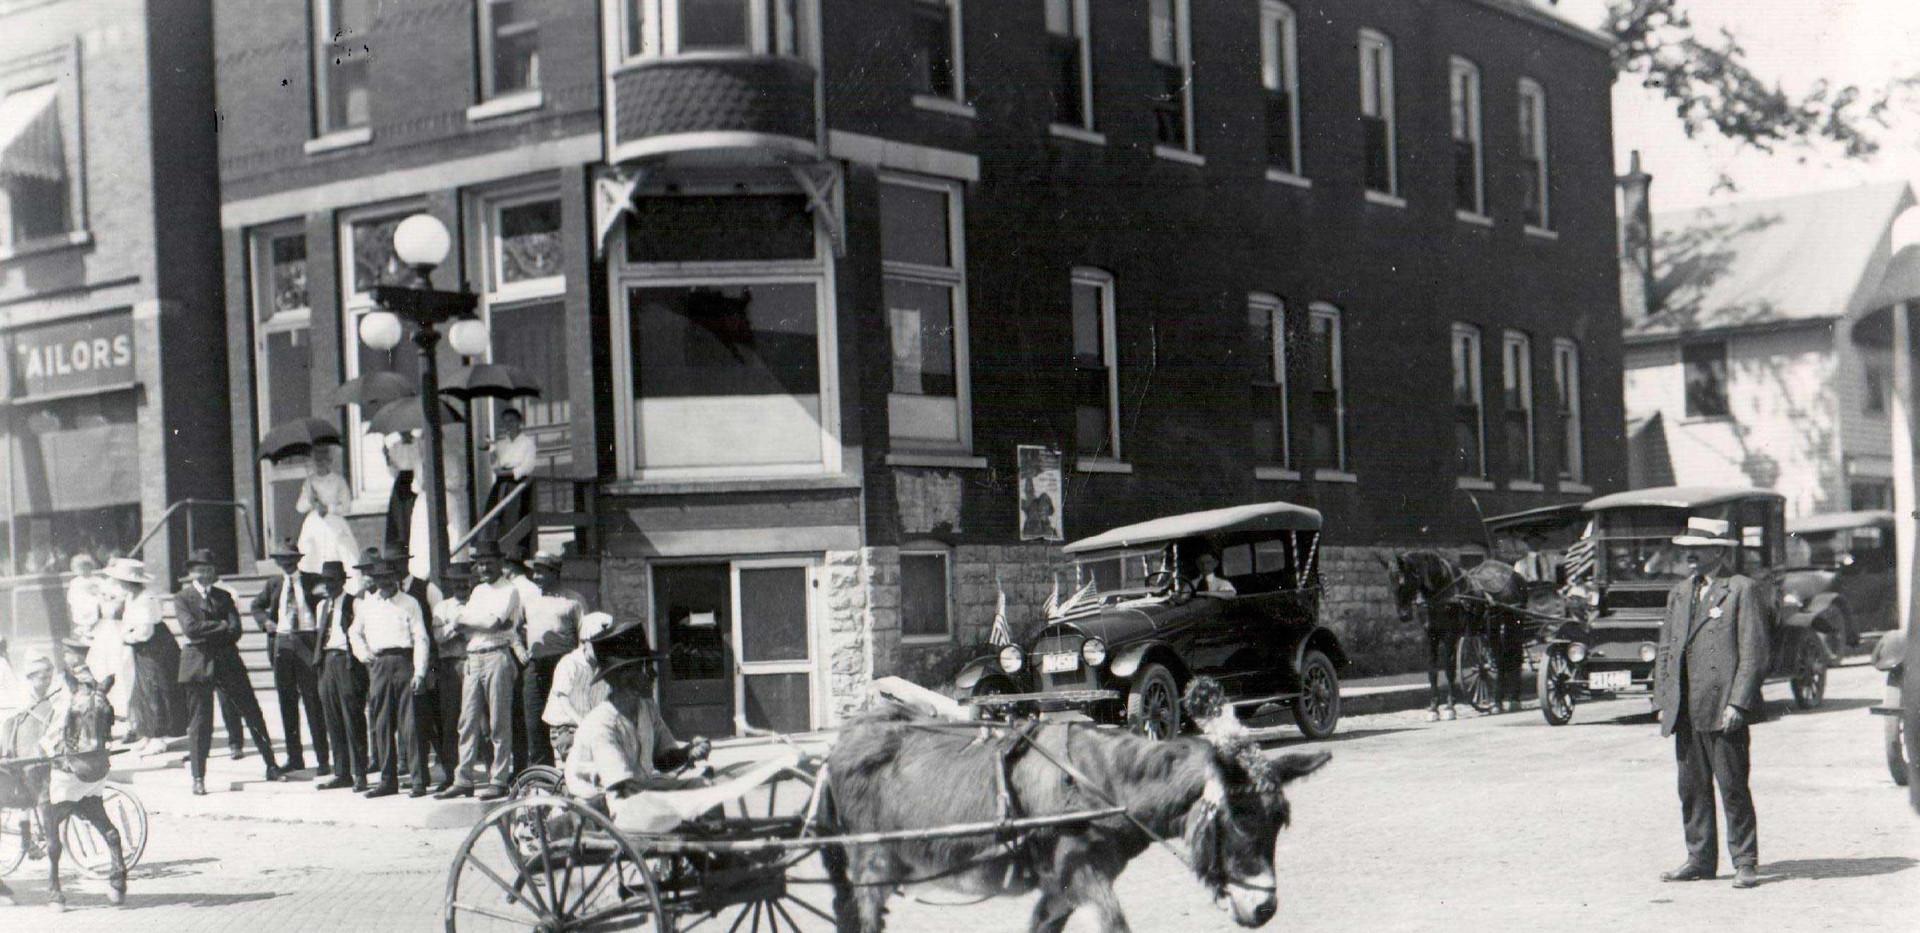 Parade_Lawtons_Donkey_1919.jpg